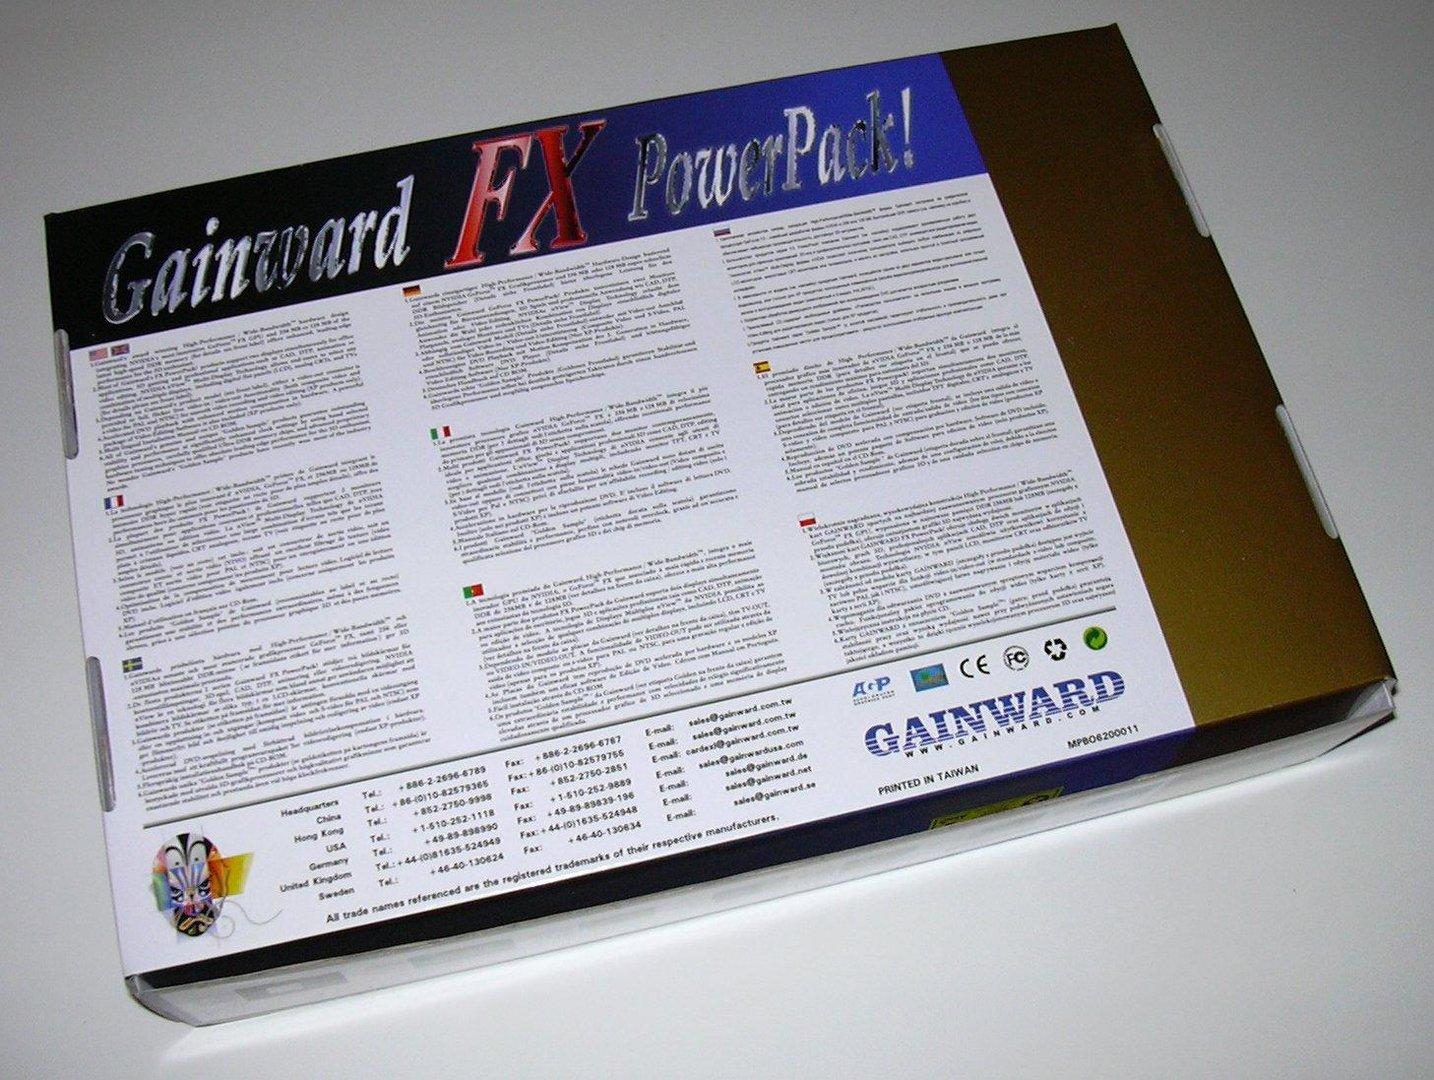 Gainward Packung Rückseite